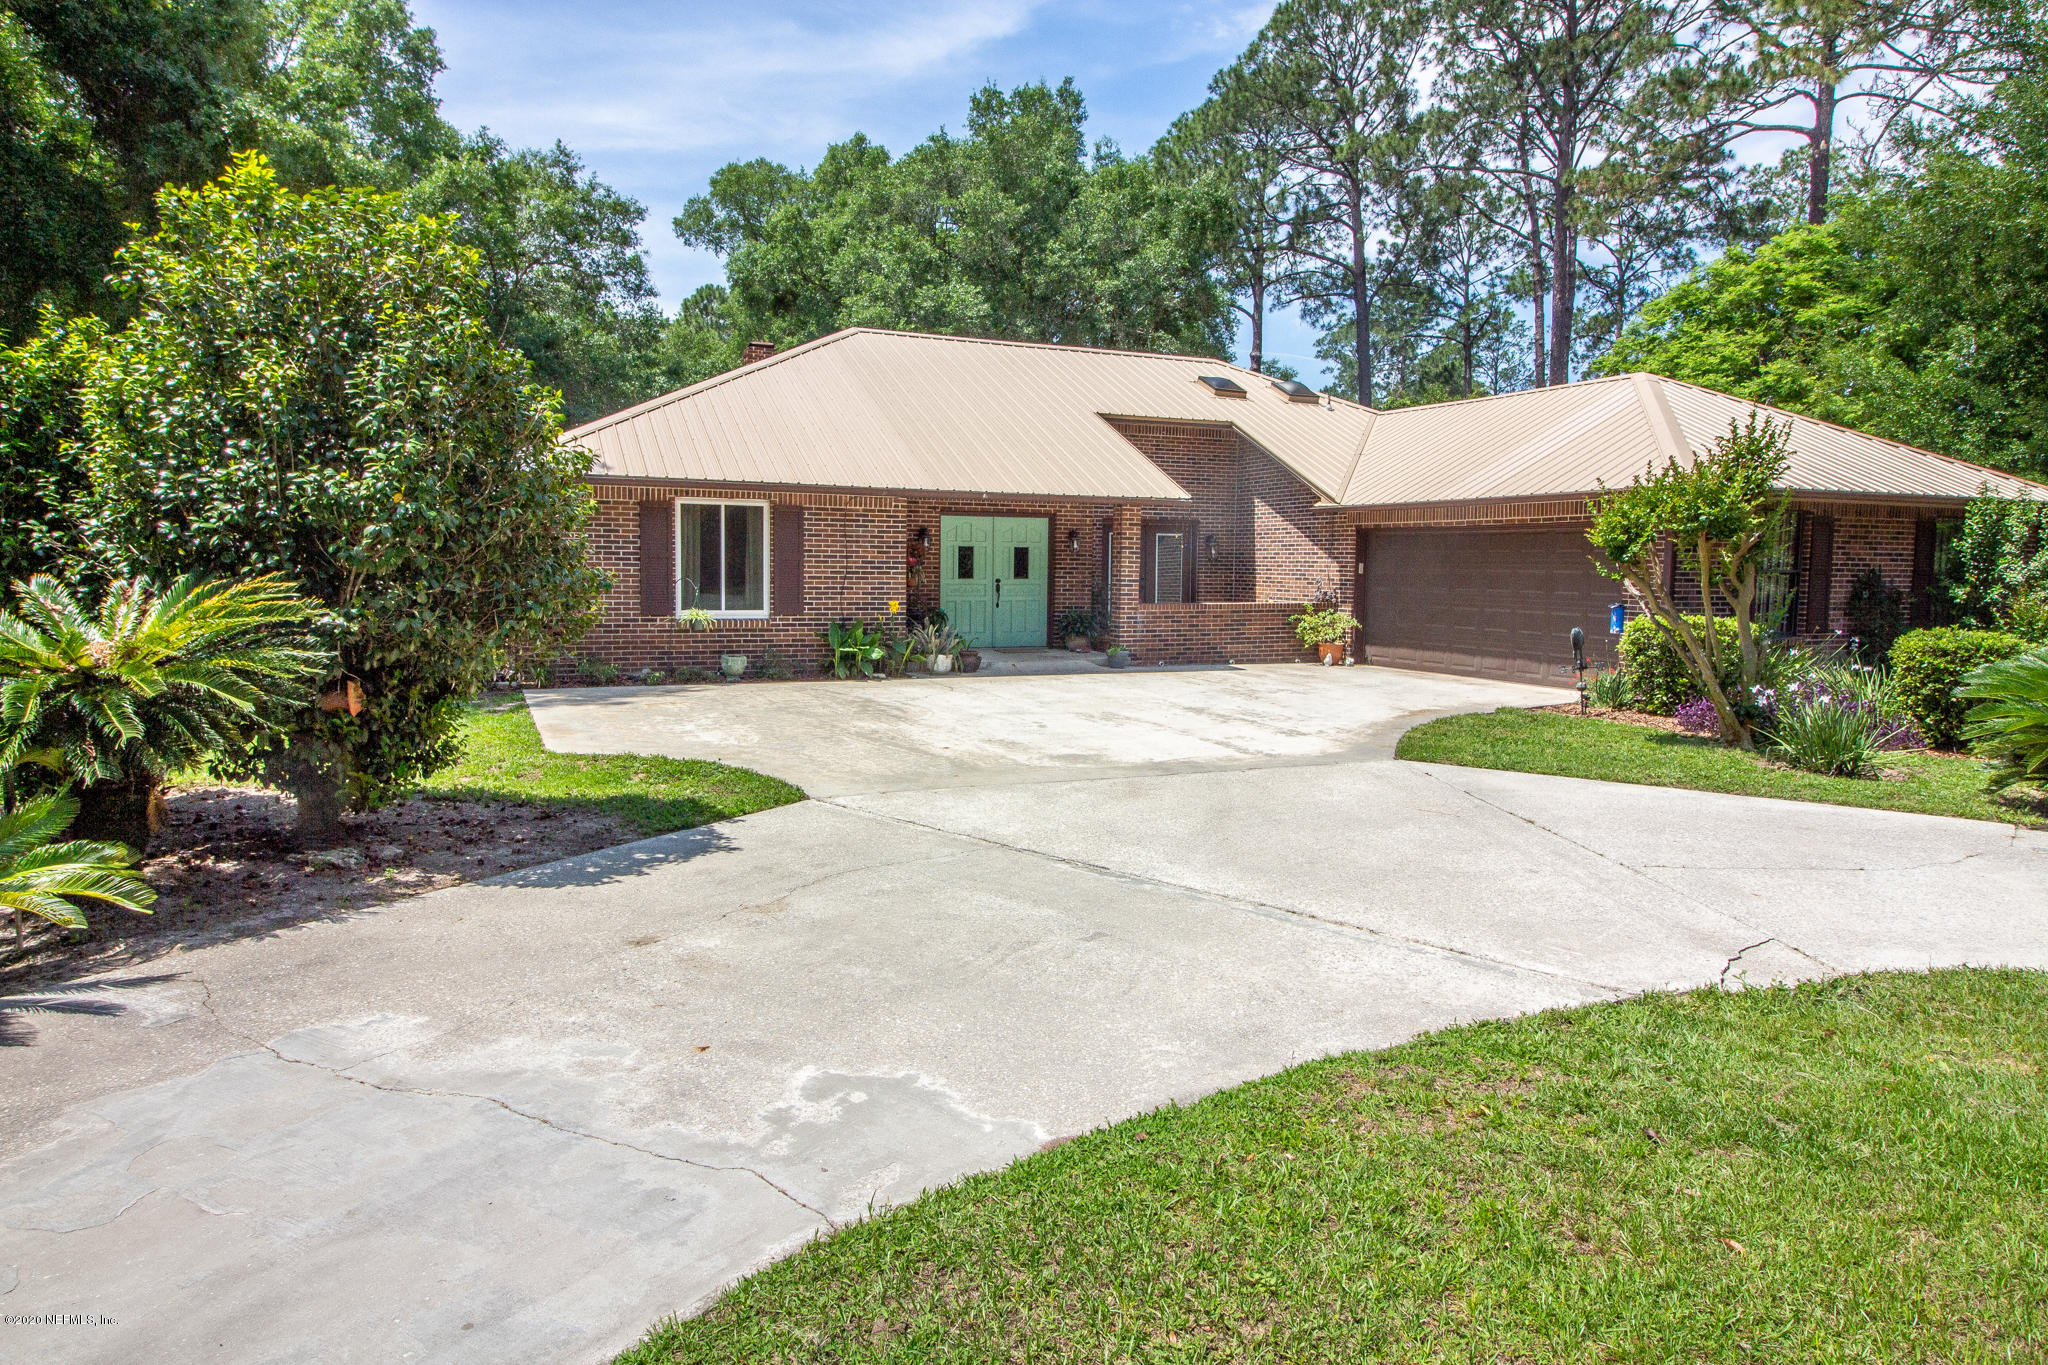 717 NIGHTINGALE, KEYSTONE HEIGHTS, FLORIDA 32656, 5 Bedrooms Bedrooms, ,3 BathroomsBathrooms,Residential,For sale,NIGHTINGALE,1050929